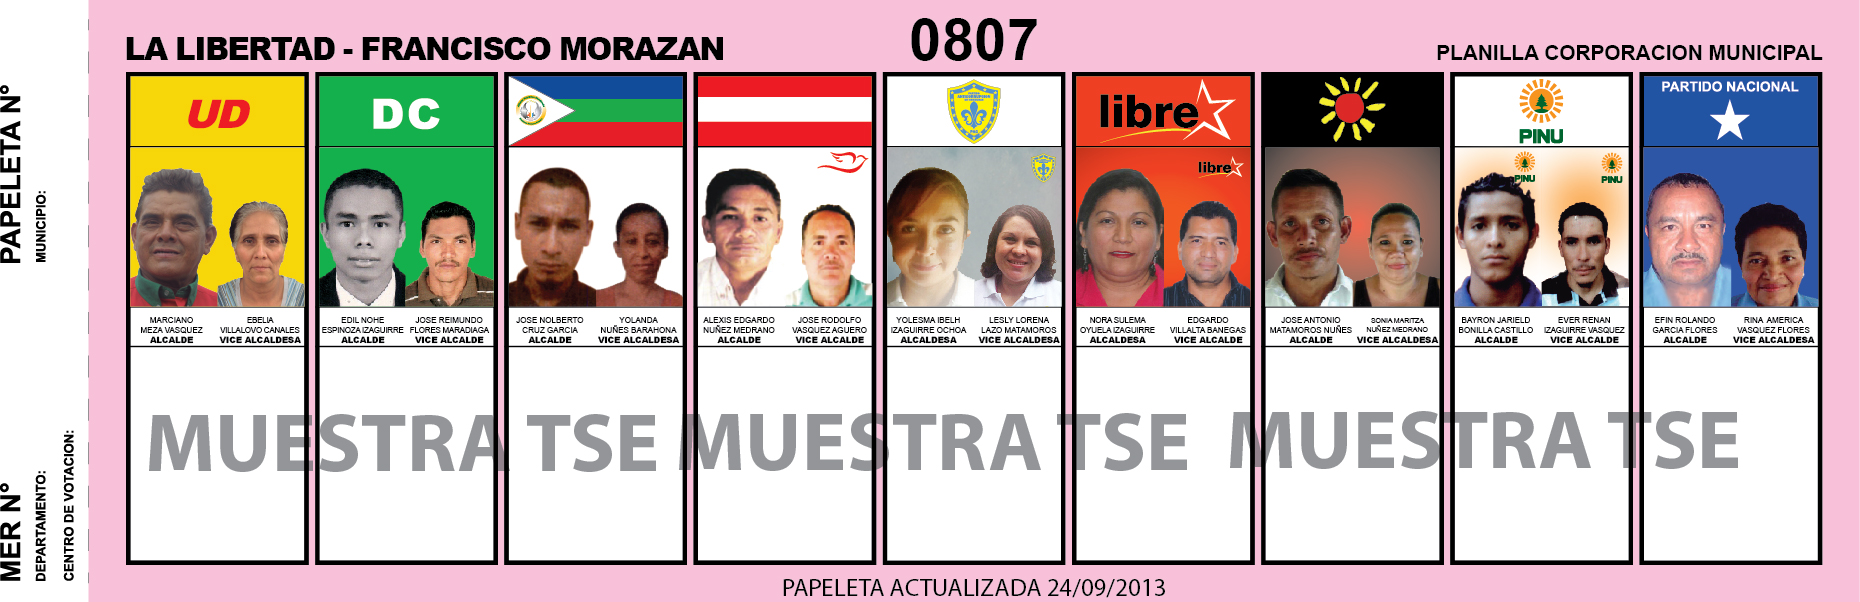 CANDIDATOS 2013 MUNICIPIO LA LIBERTAD - FRANCISCO MORAZAN - HONDURAS